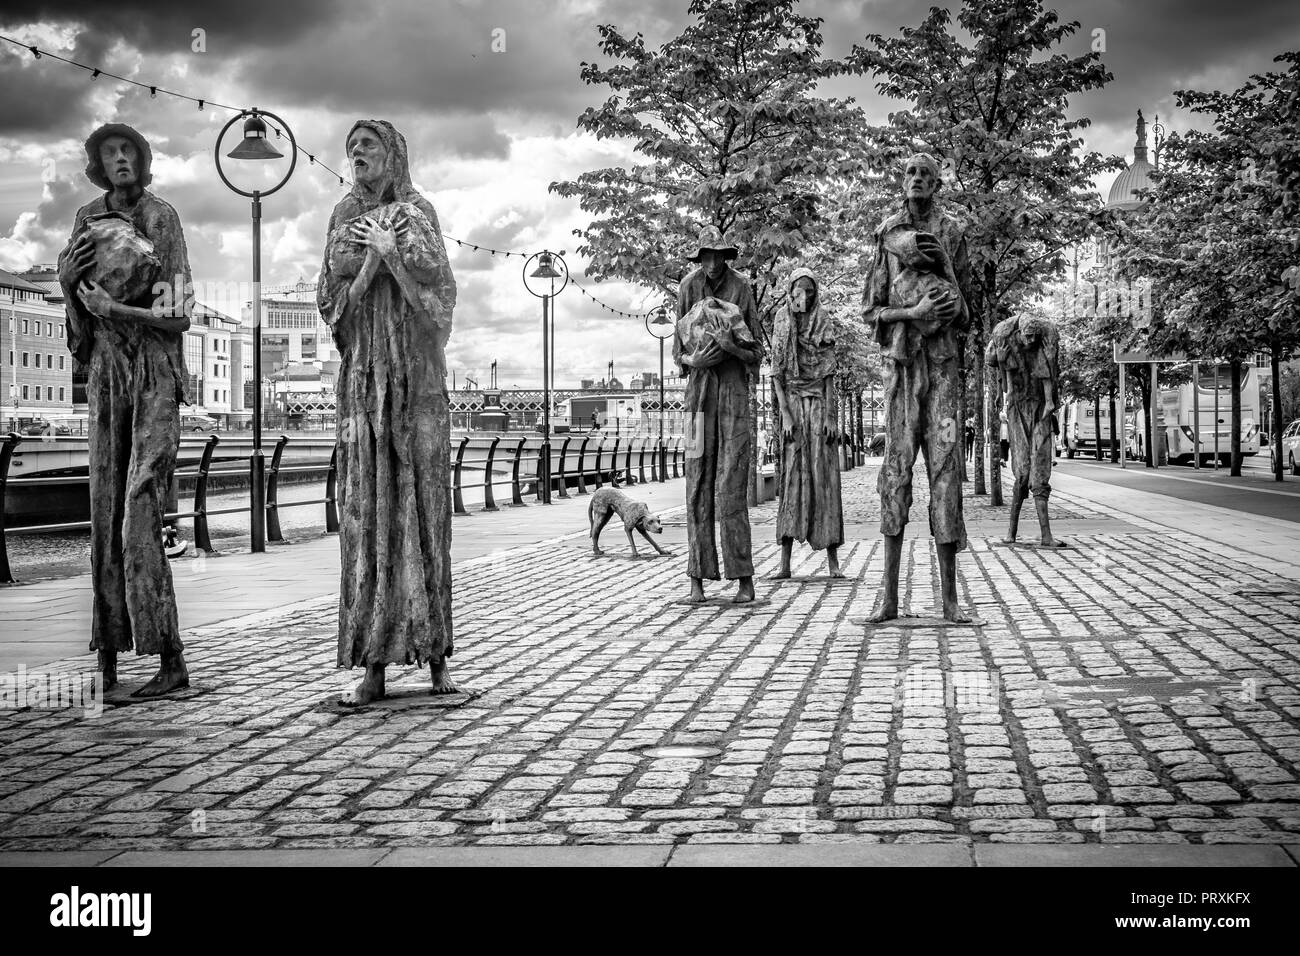 Great Famine Statue, Custom House Quay, Dublin, Ireland, Europe. - Stock Image